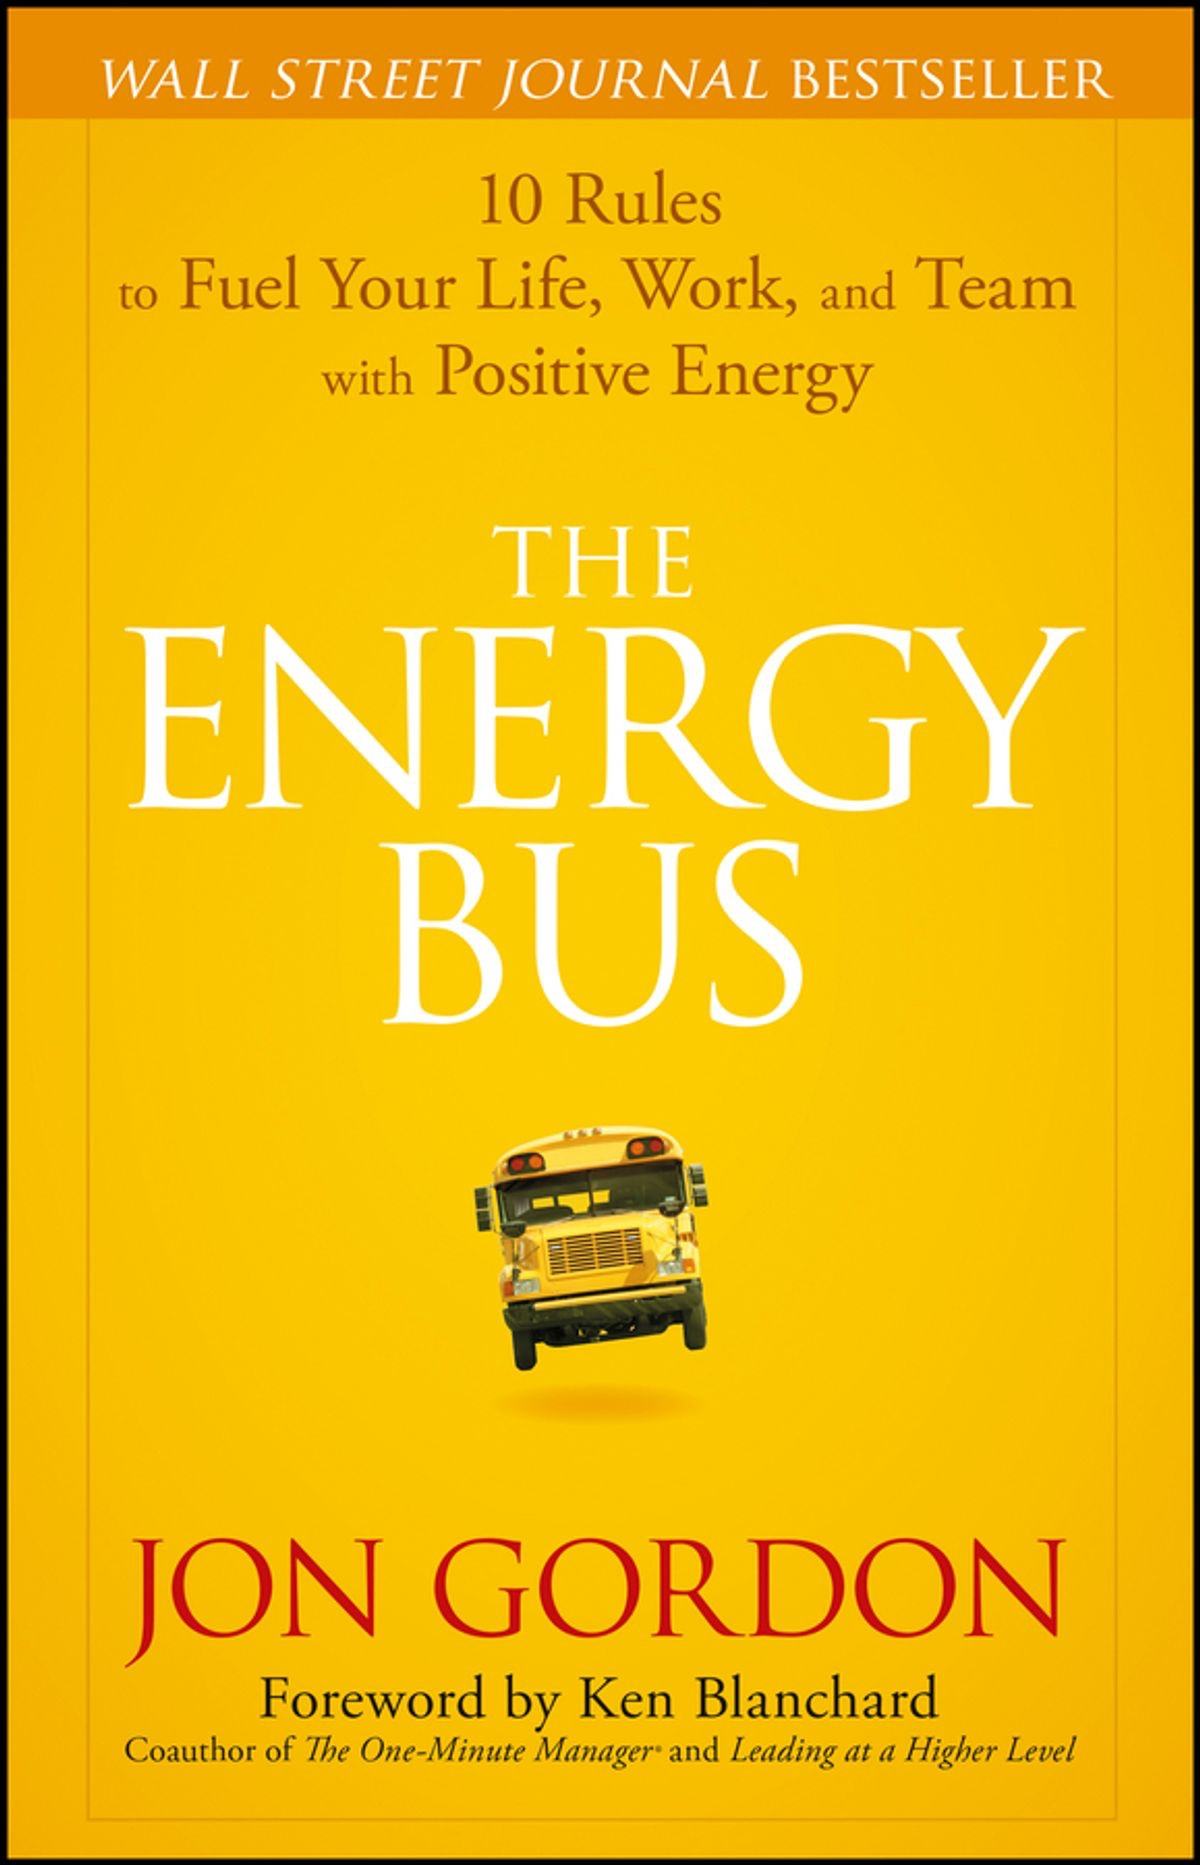 THE ENERGY BUS WORKSHEET DOWNLOAD    BUY THE ENERGY BUS ONLINE